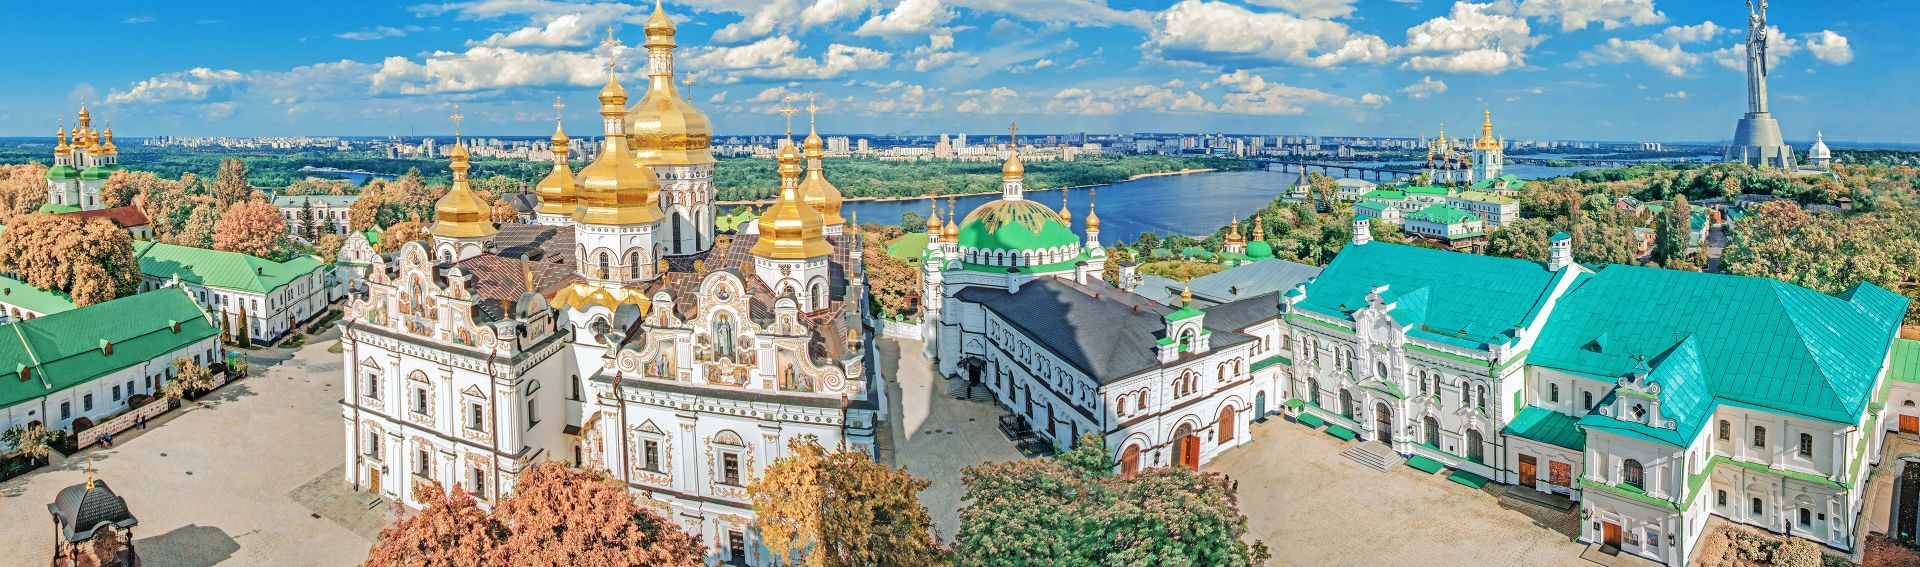 Kiew / Kiev